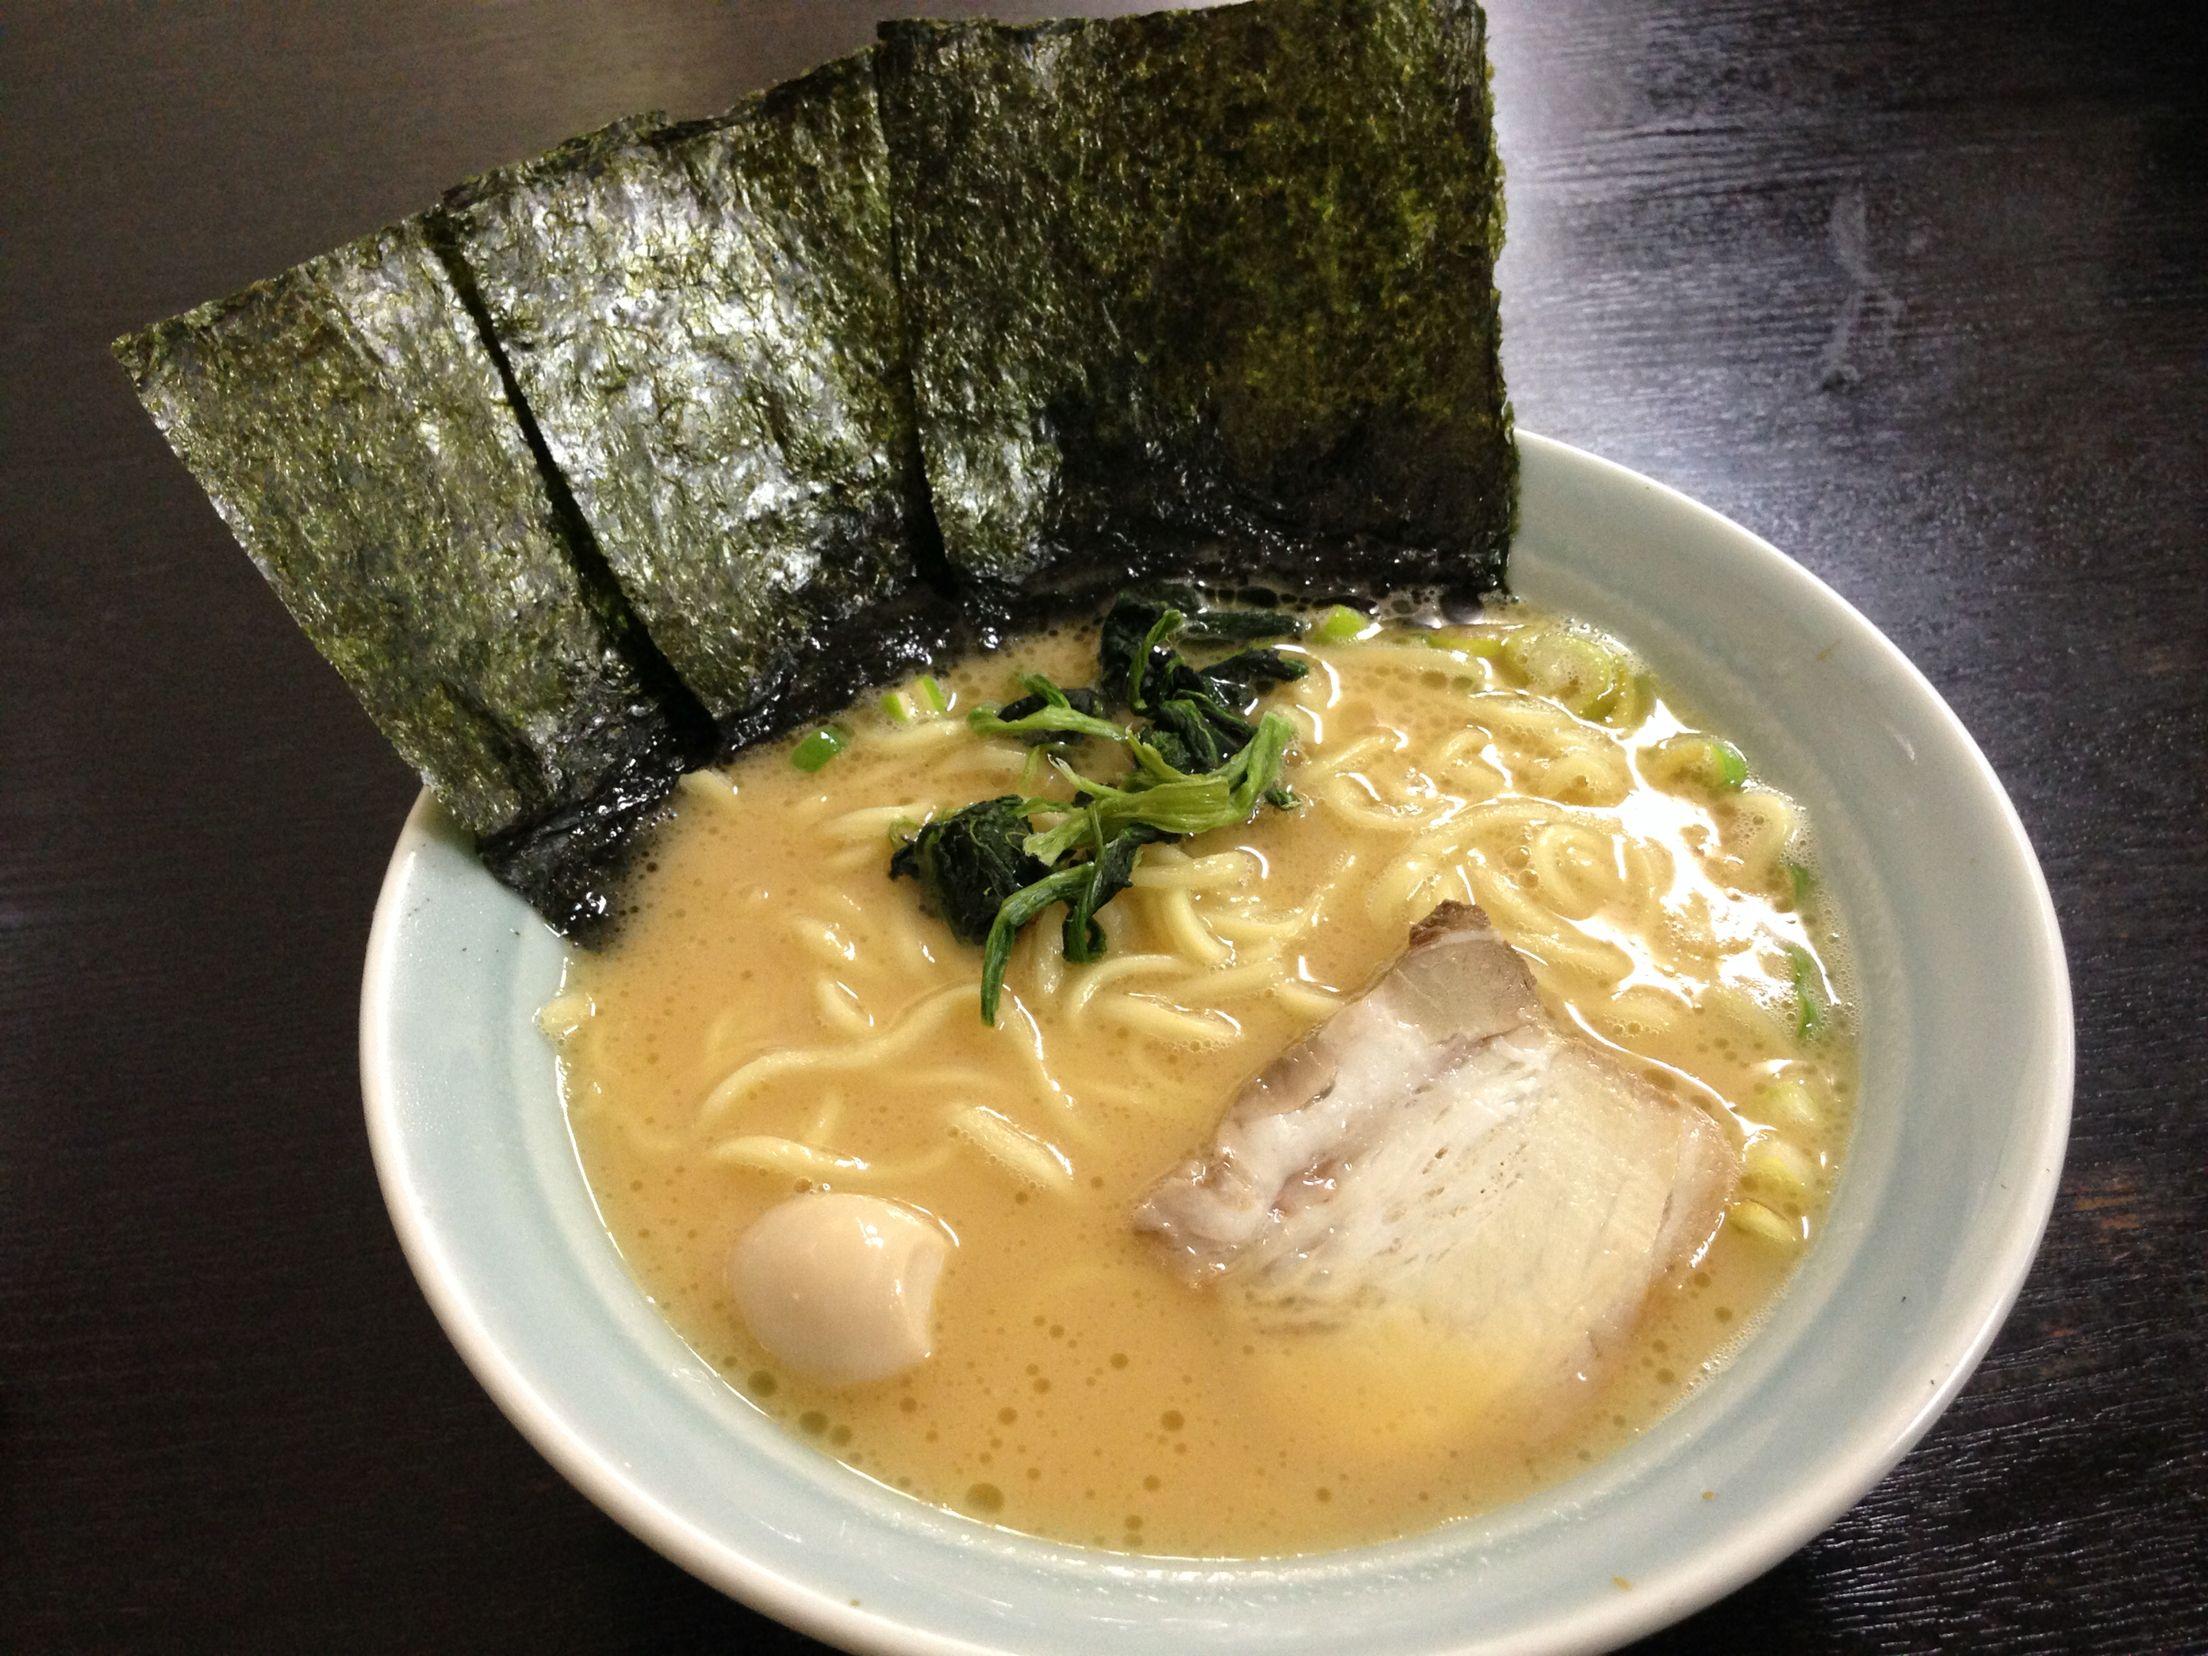 Ramen Noodles Tokyo Japan Gourmet ラーメン 拉麺 東京 日本